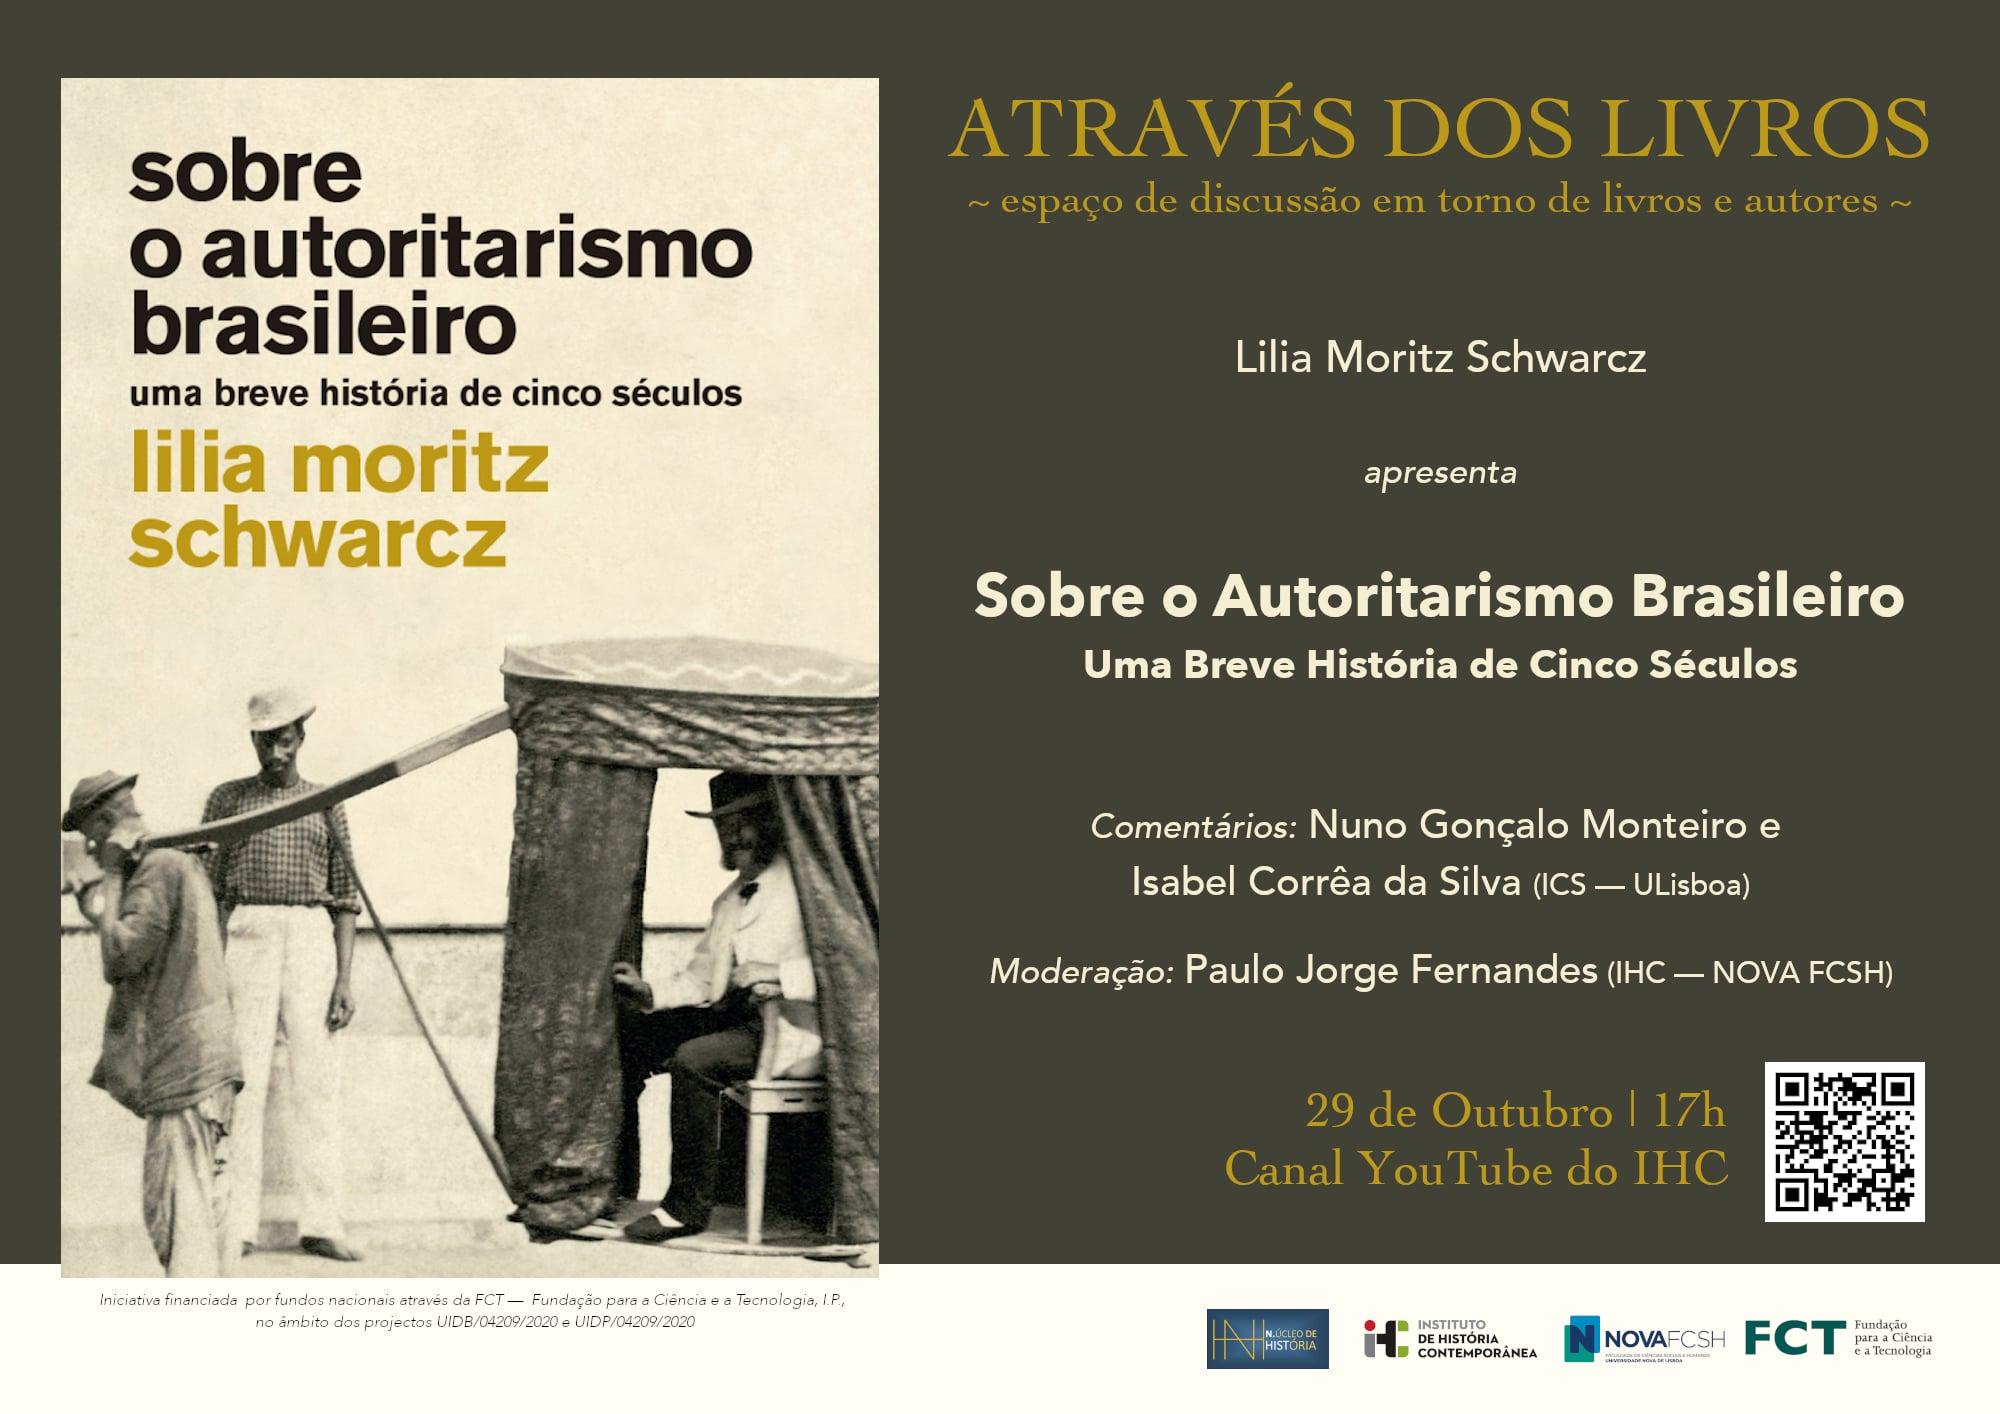 Através dos Livros: Sobre o Autoritarismo Brasileiro, comentários de Nuno Gonçalo Monteiro e Isabel Correa e Silva